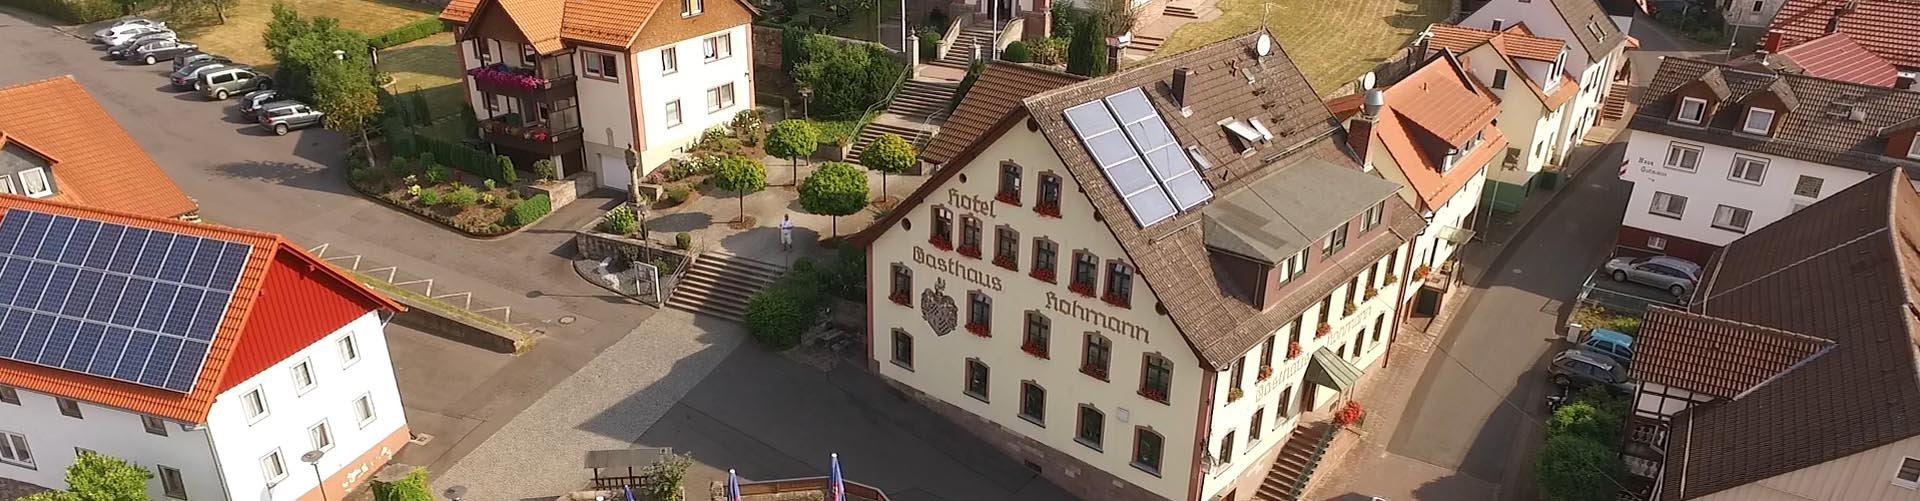 Landhotel Gasthof Hohmann